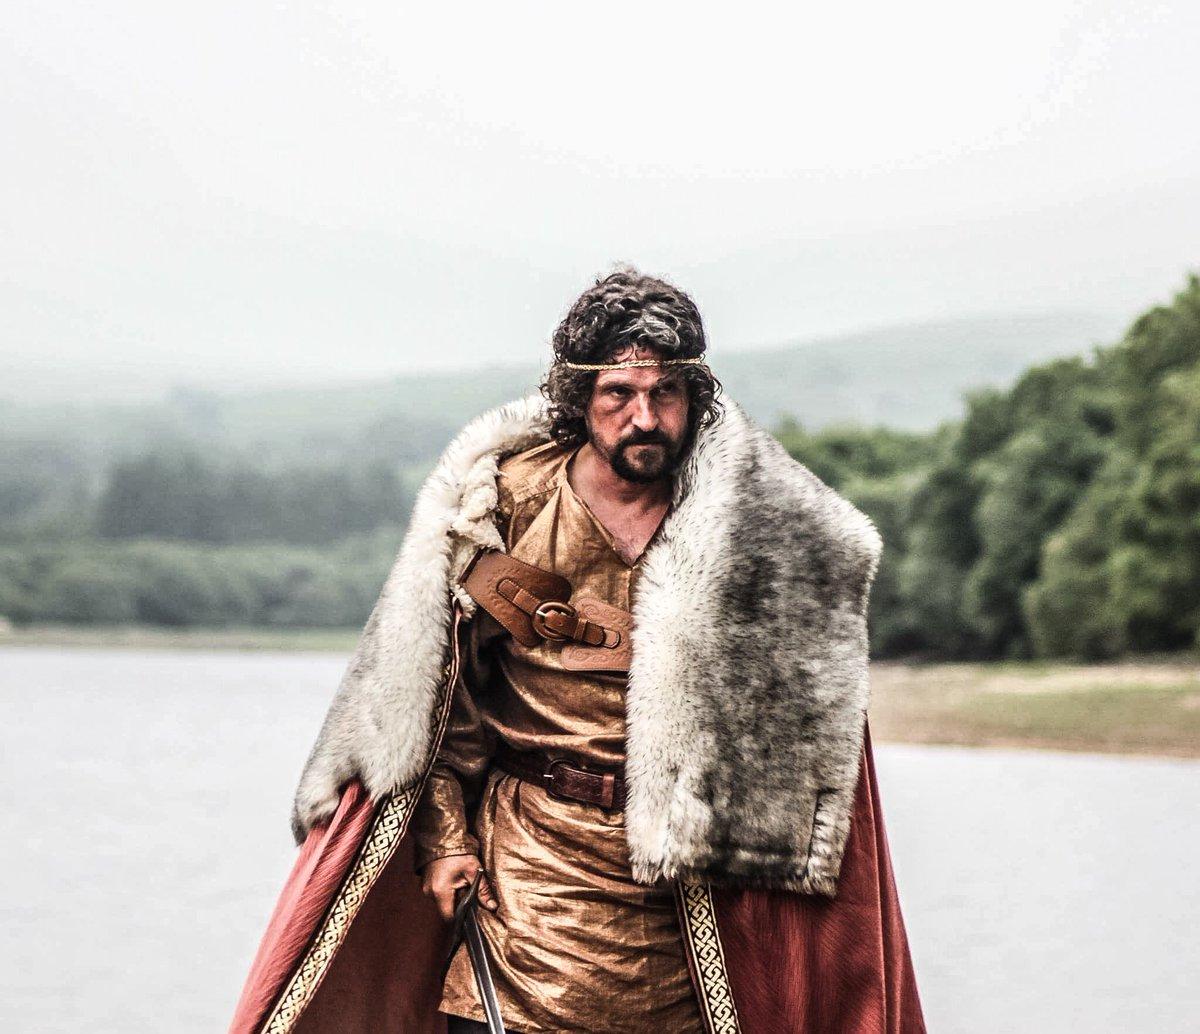 #film As King Arthur in #MordredTheMovie OUT in 2018 @sdevonplayers . Good Evening ! Bonne soirée ! X<br>http://pic.twitter.com/HglL83wZZ1